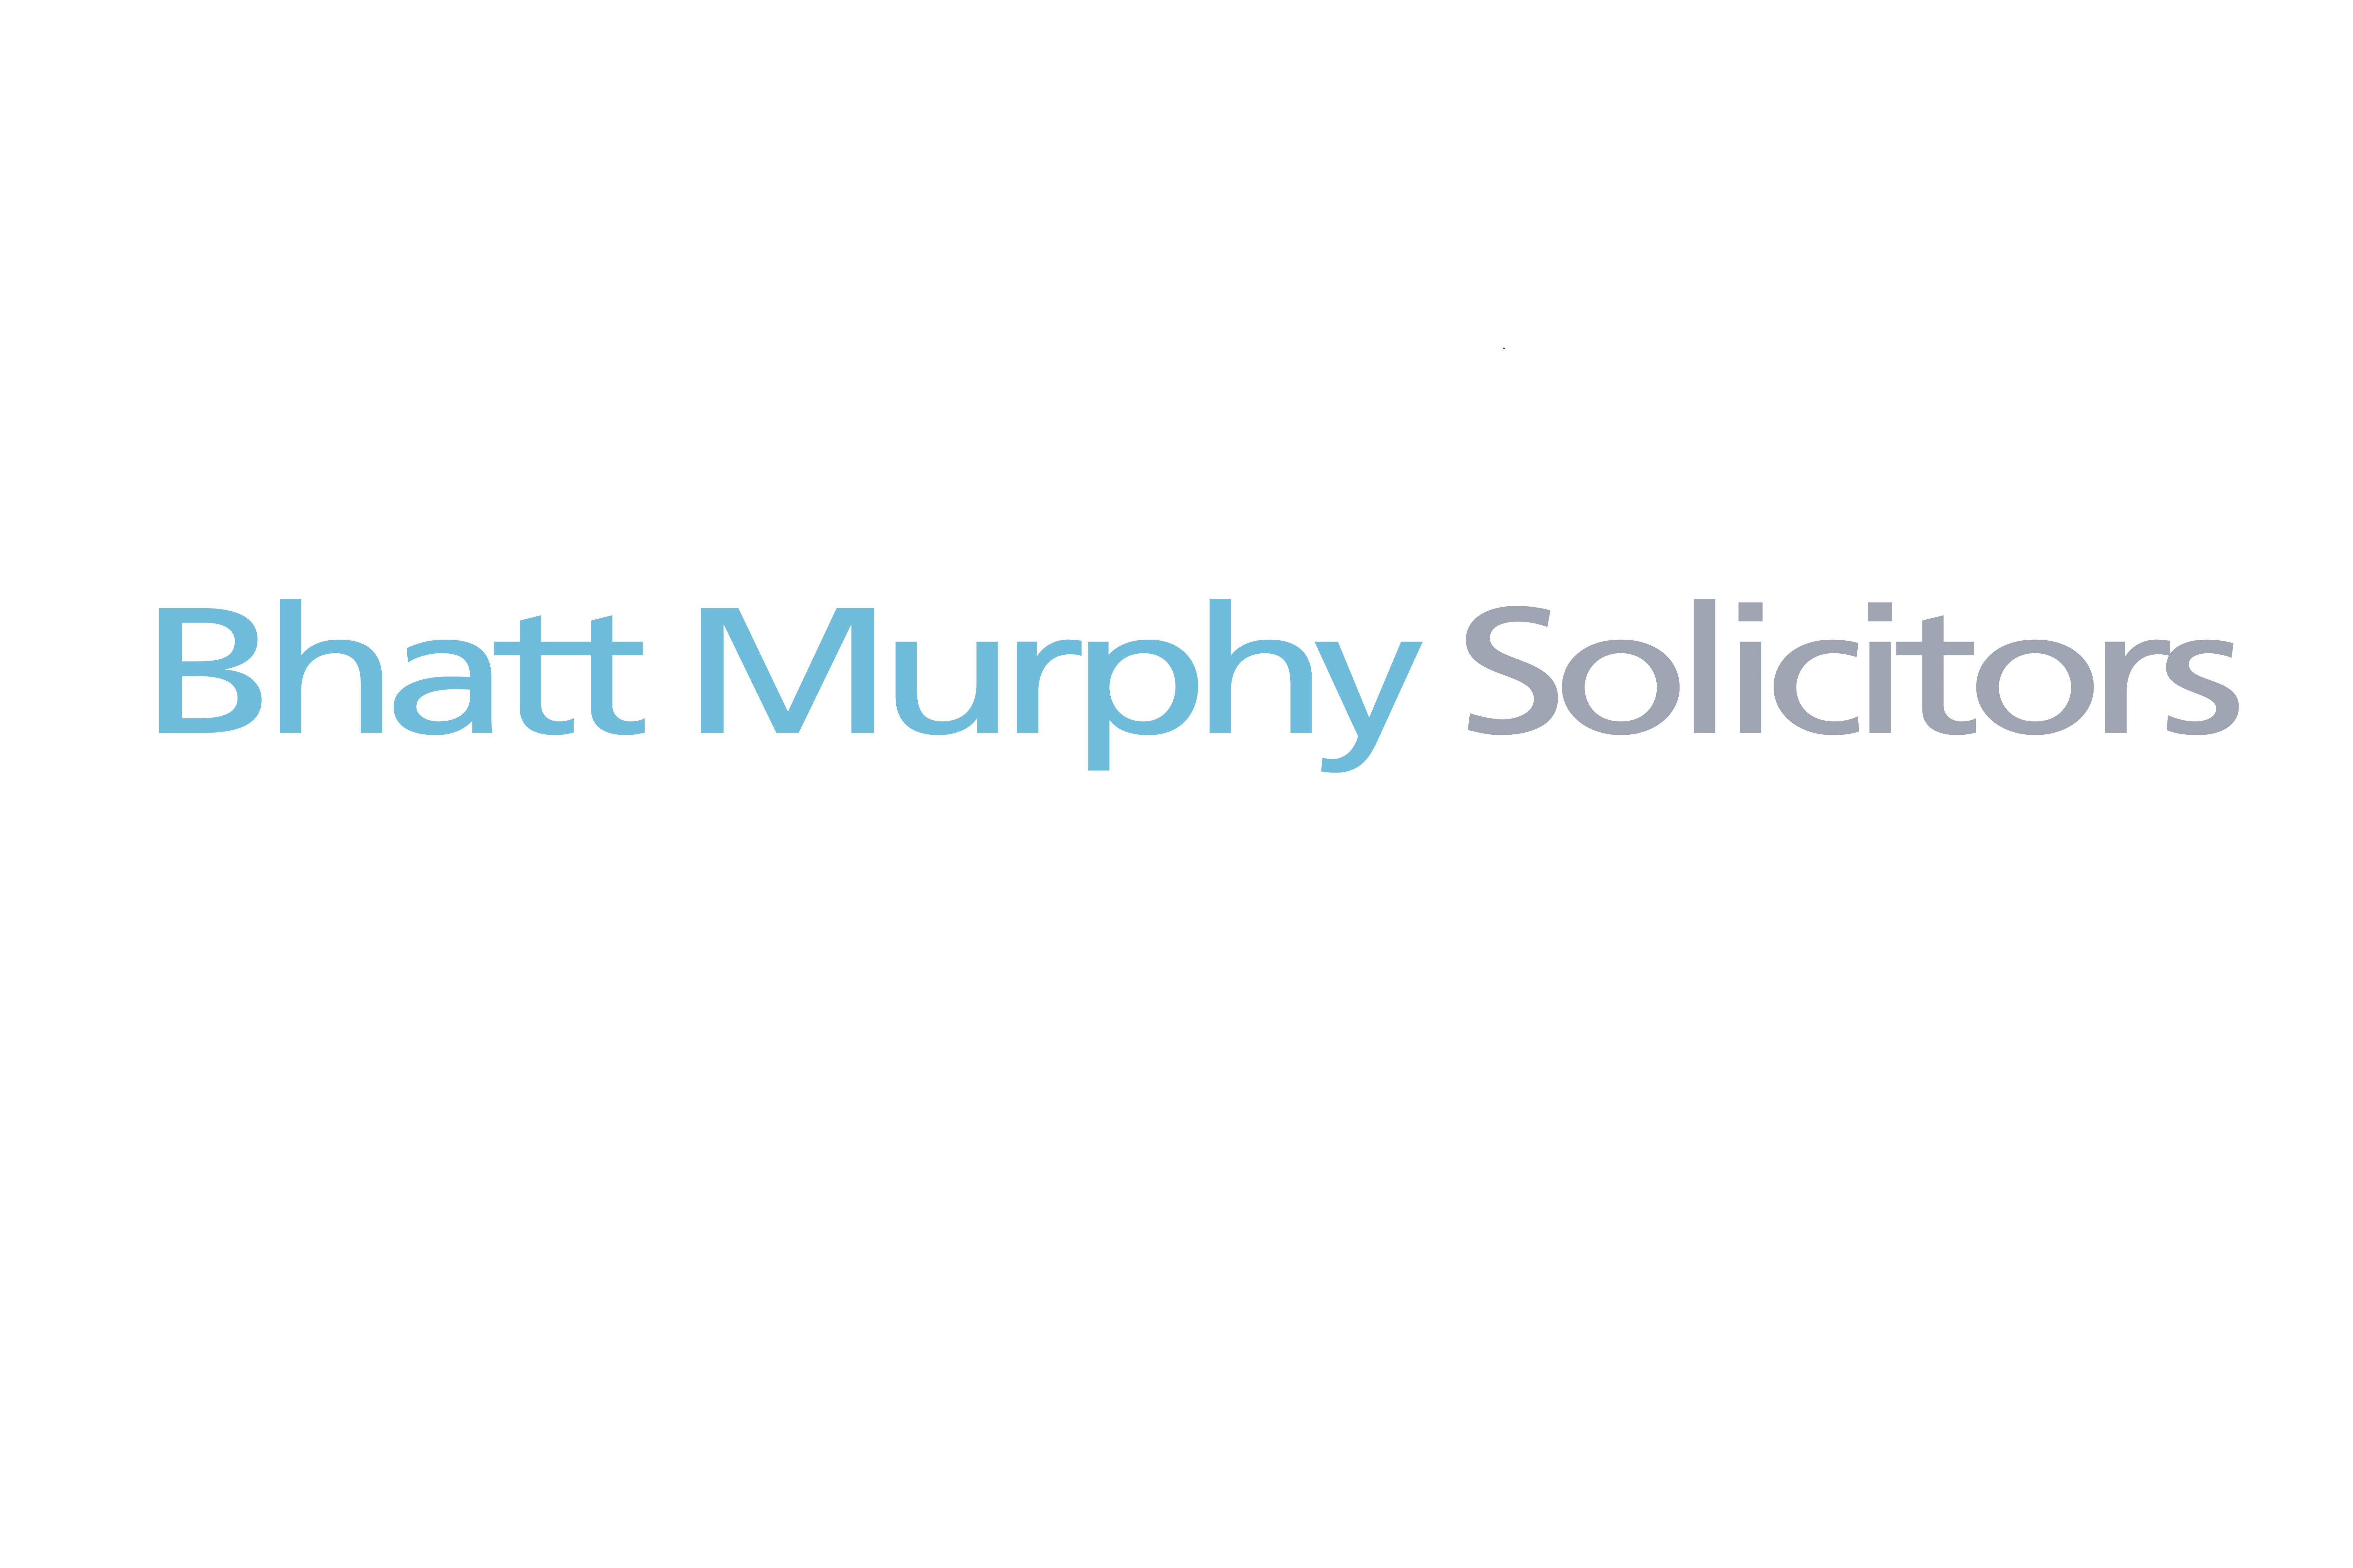 Bhatt Murphy